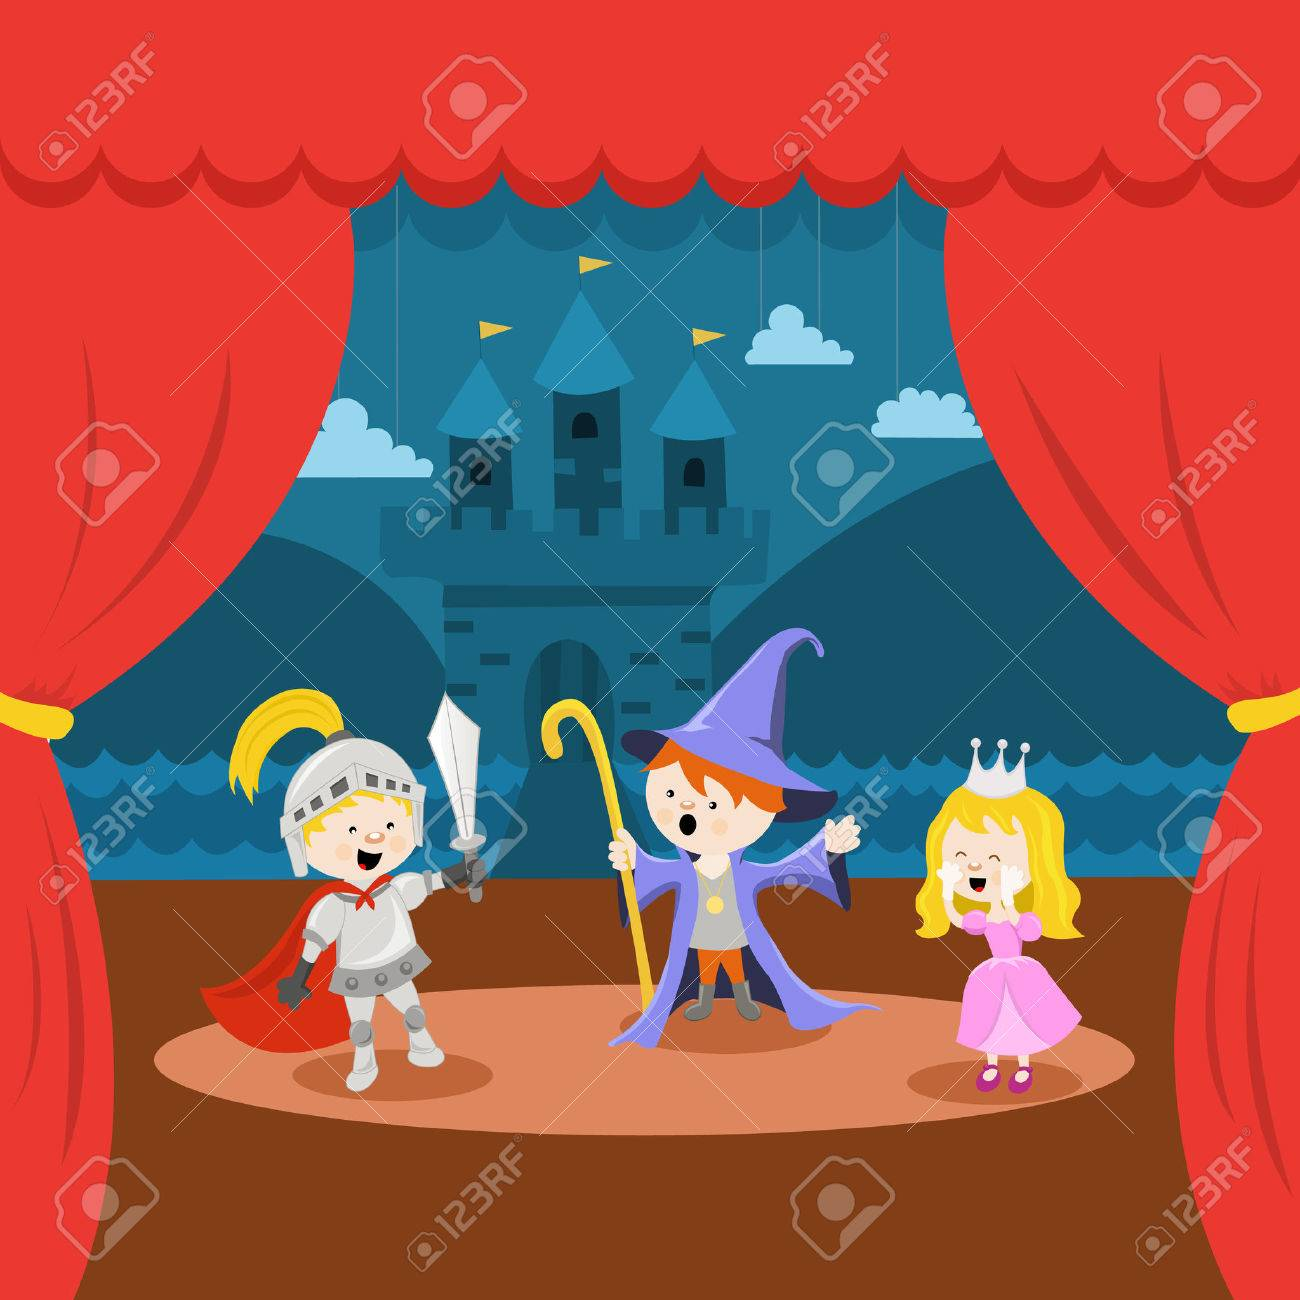 Little Kids' Theater Performance - 68739810